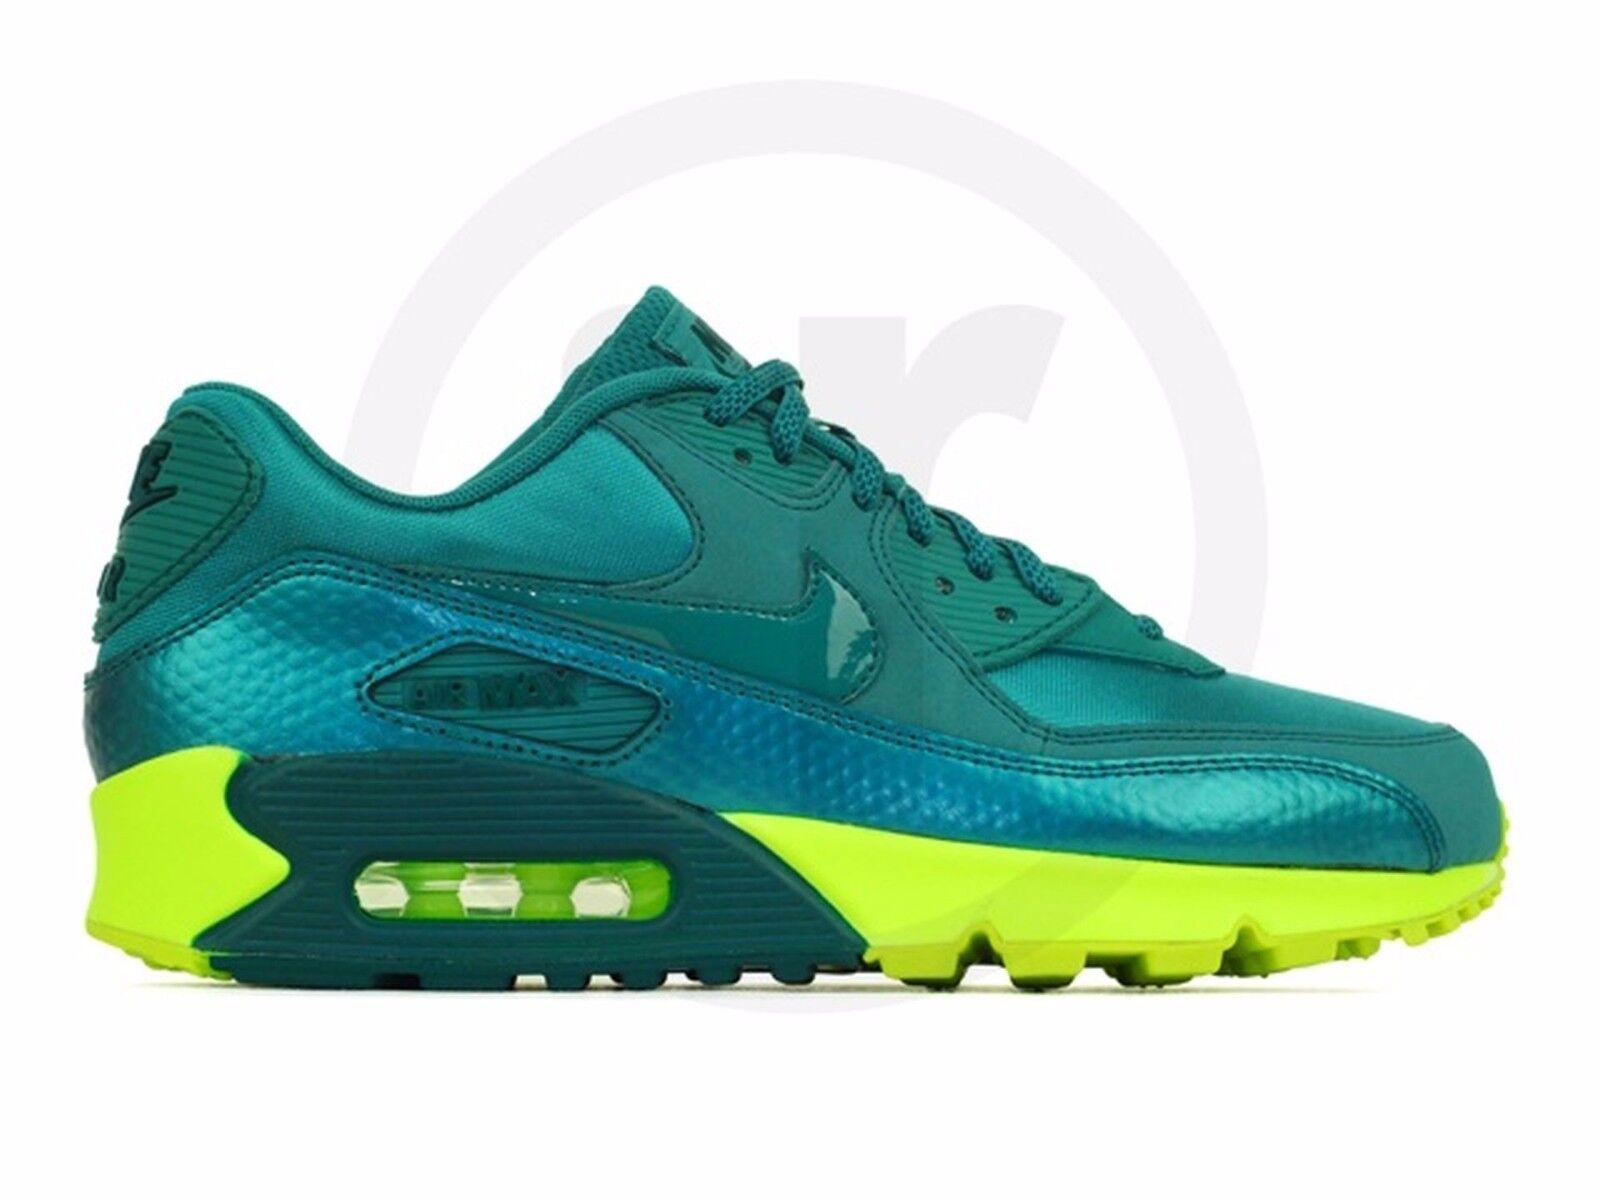 Nike Air Max 90  Womens Size 7.5 325213-306 MINERAL TEAL/MNRL TL-VLT-DRK S